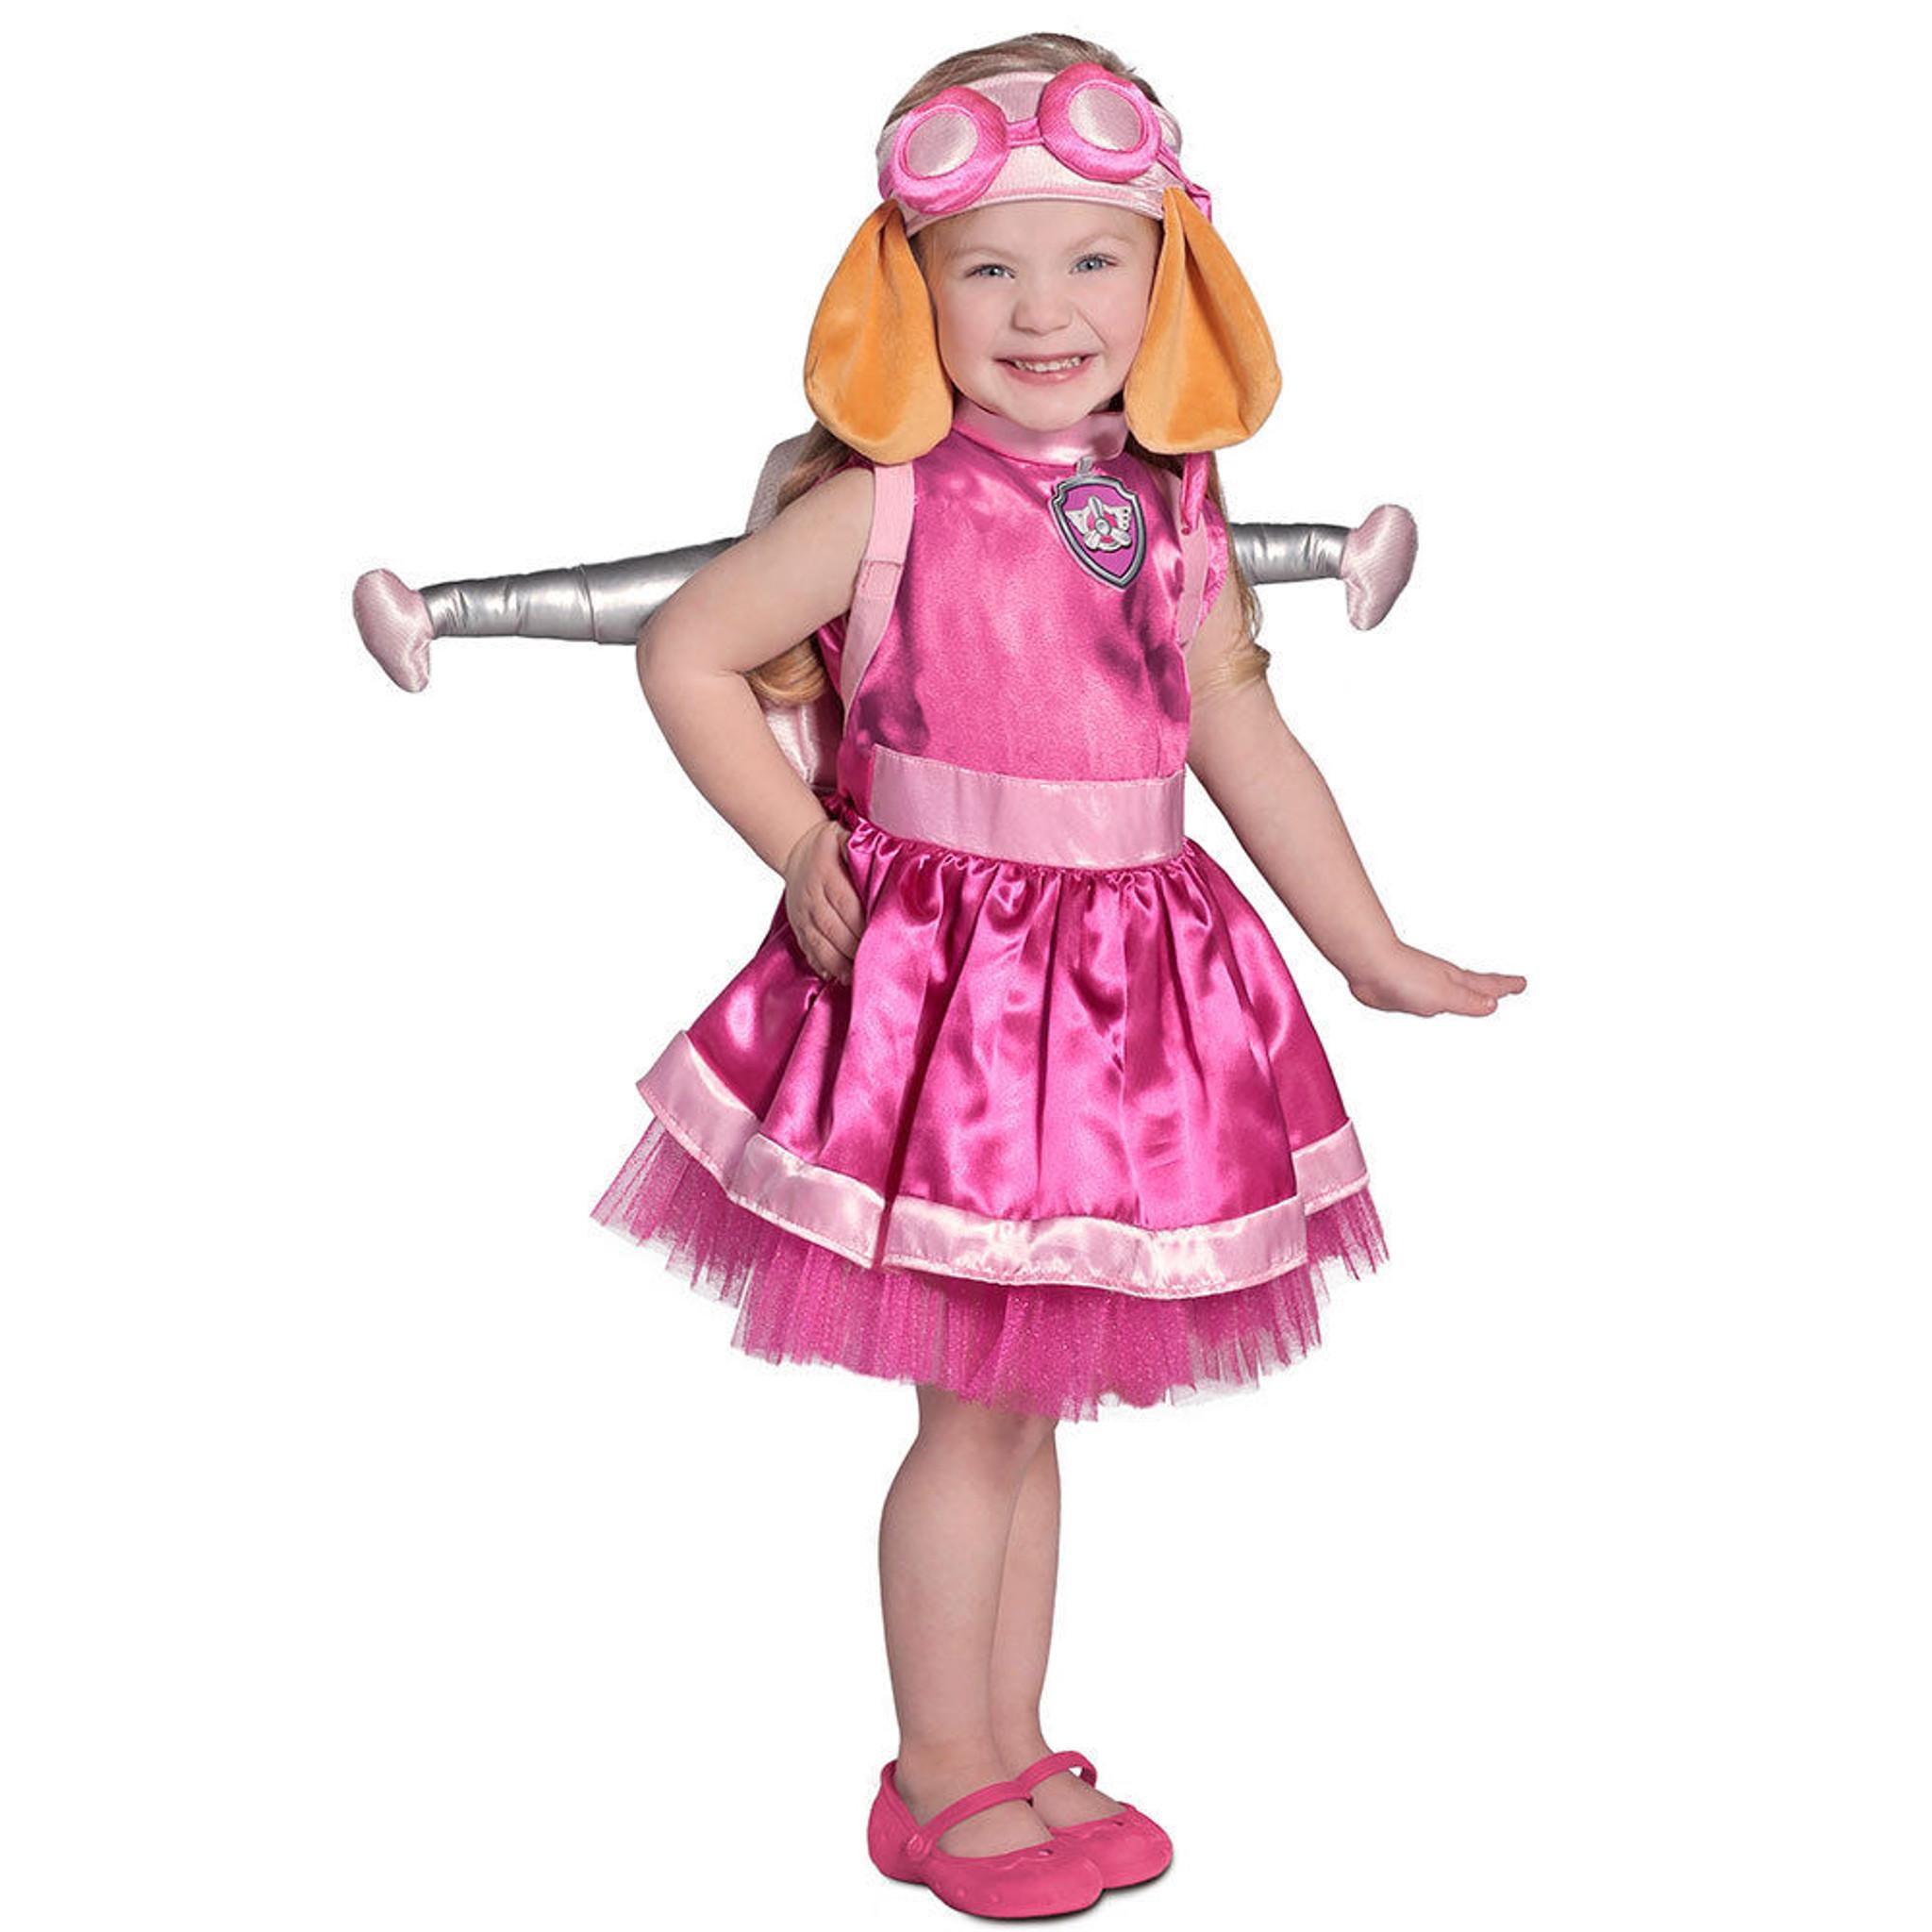 Paw Patrol Skye Toddler & Kids Deluxe Costume